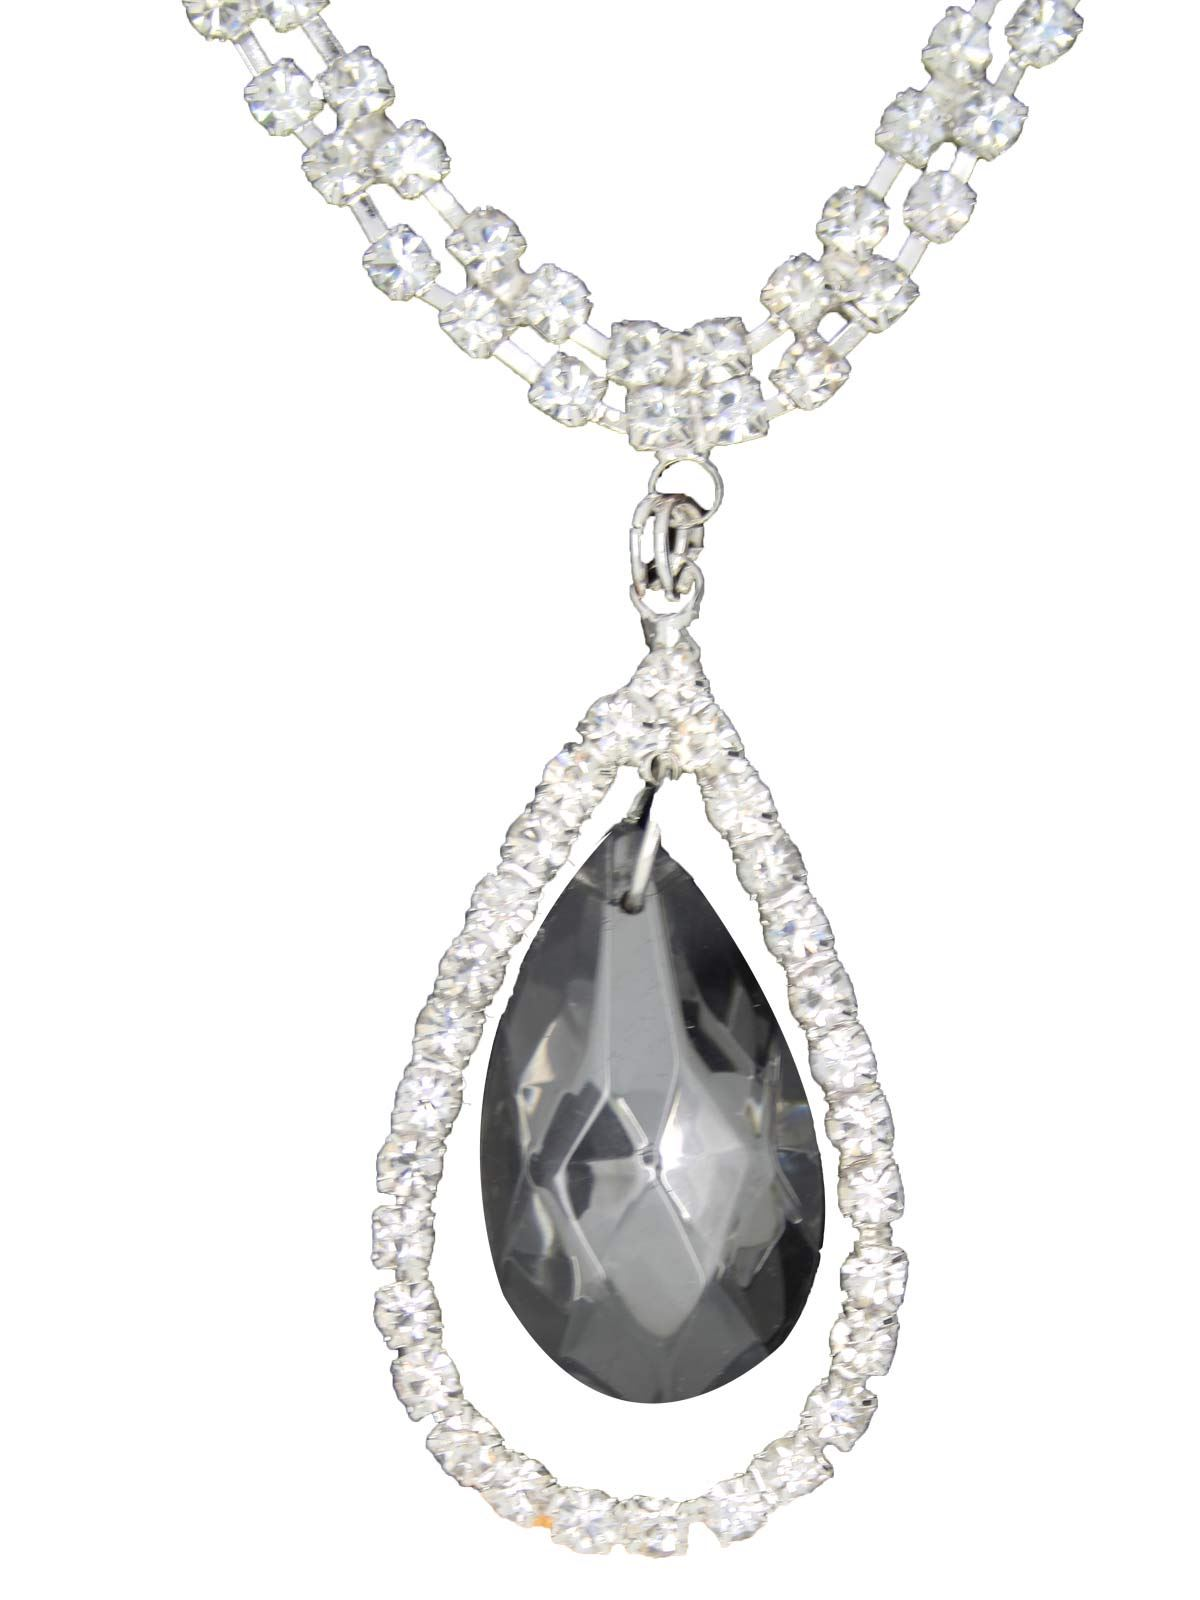 True-Face-Ladies-Women-039-s-Elegant-Earrings-Necklace-Set-Metal-Alloy-Jewellery thumbnail 45